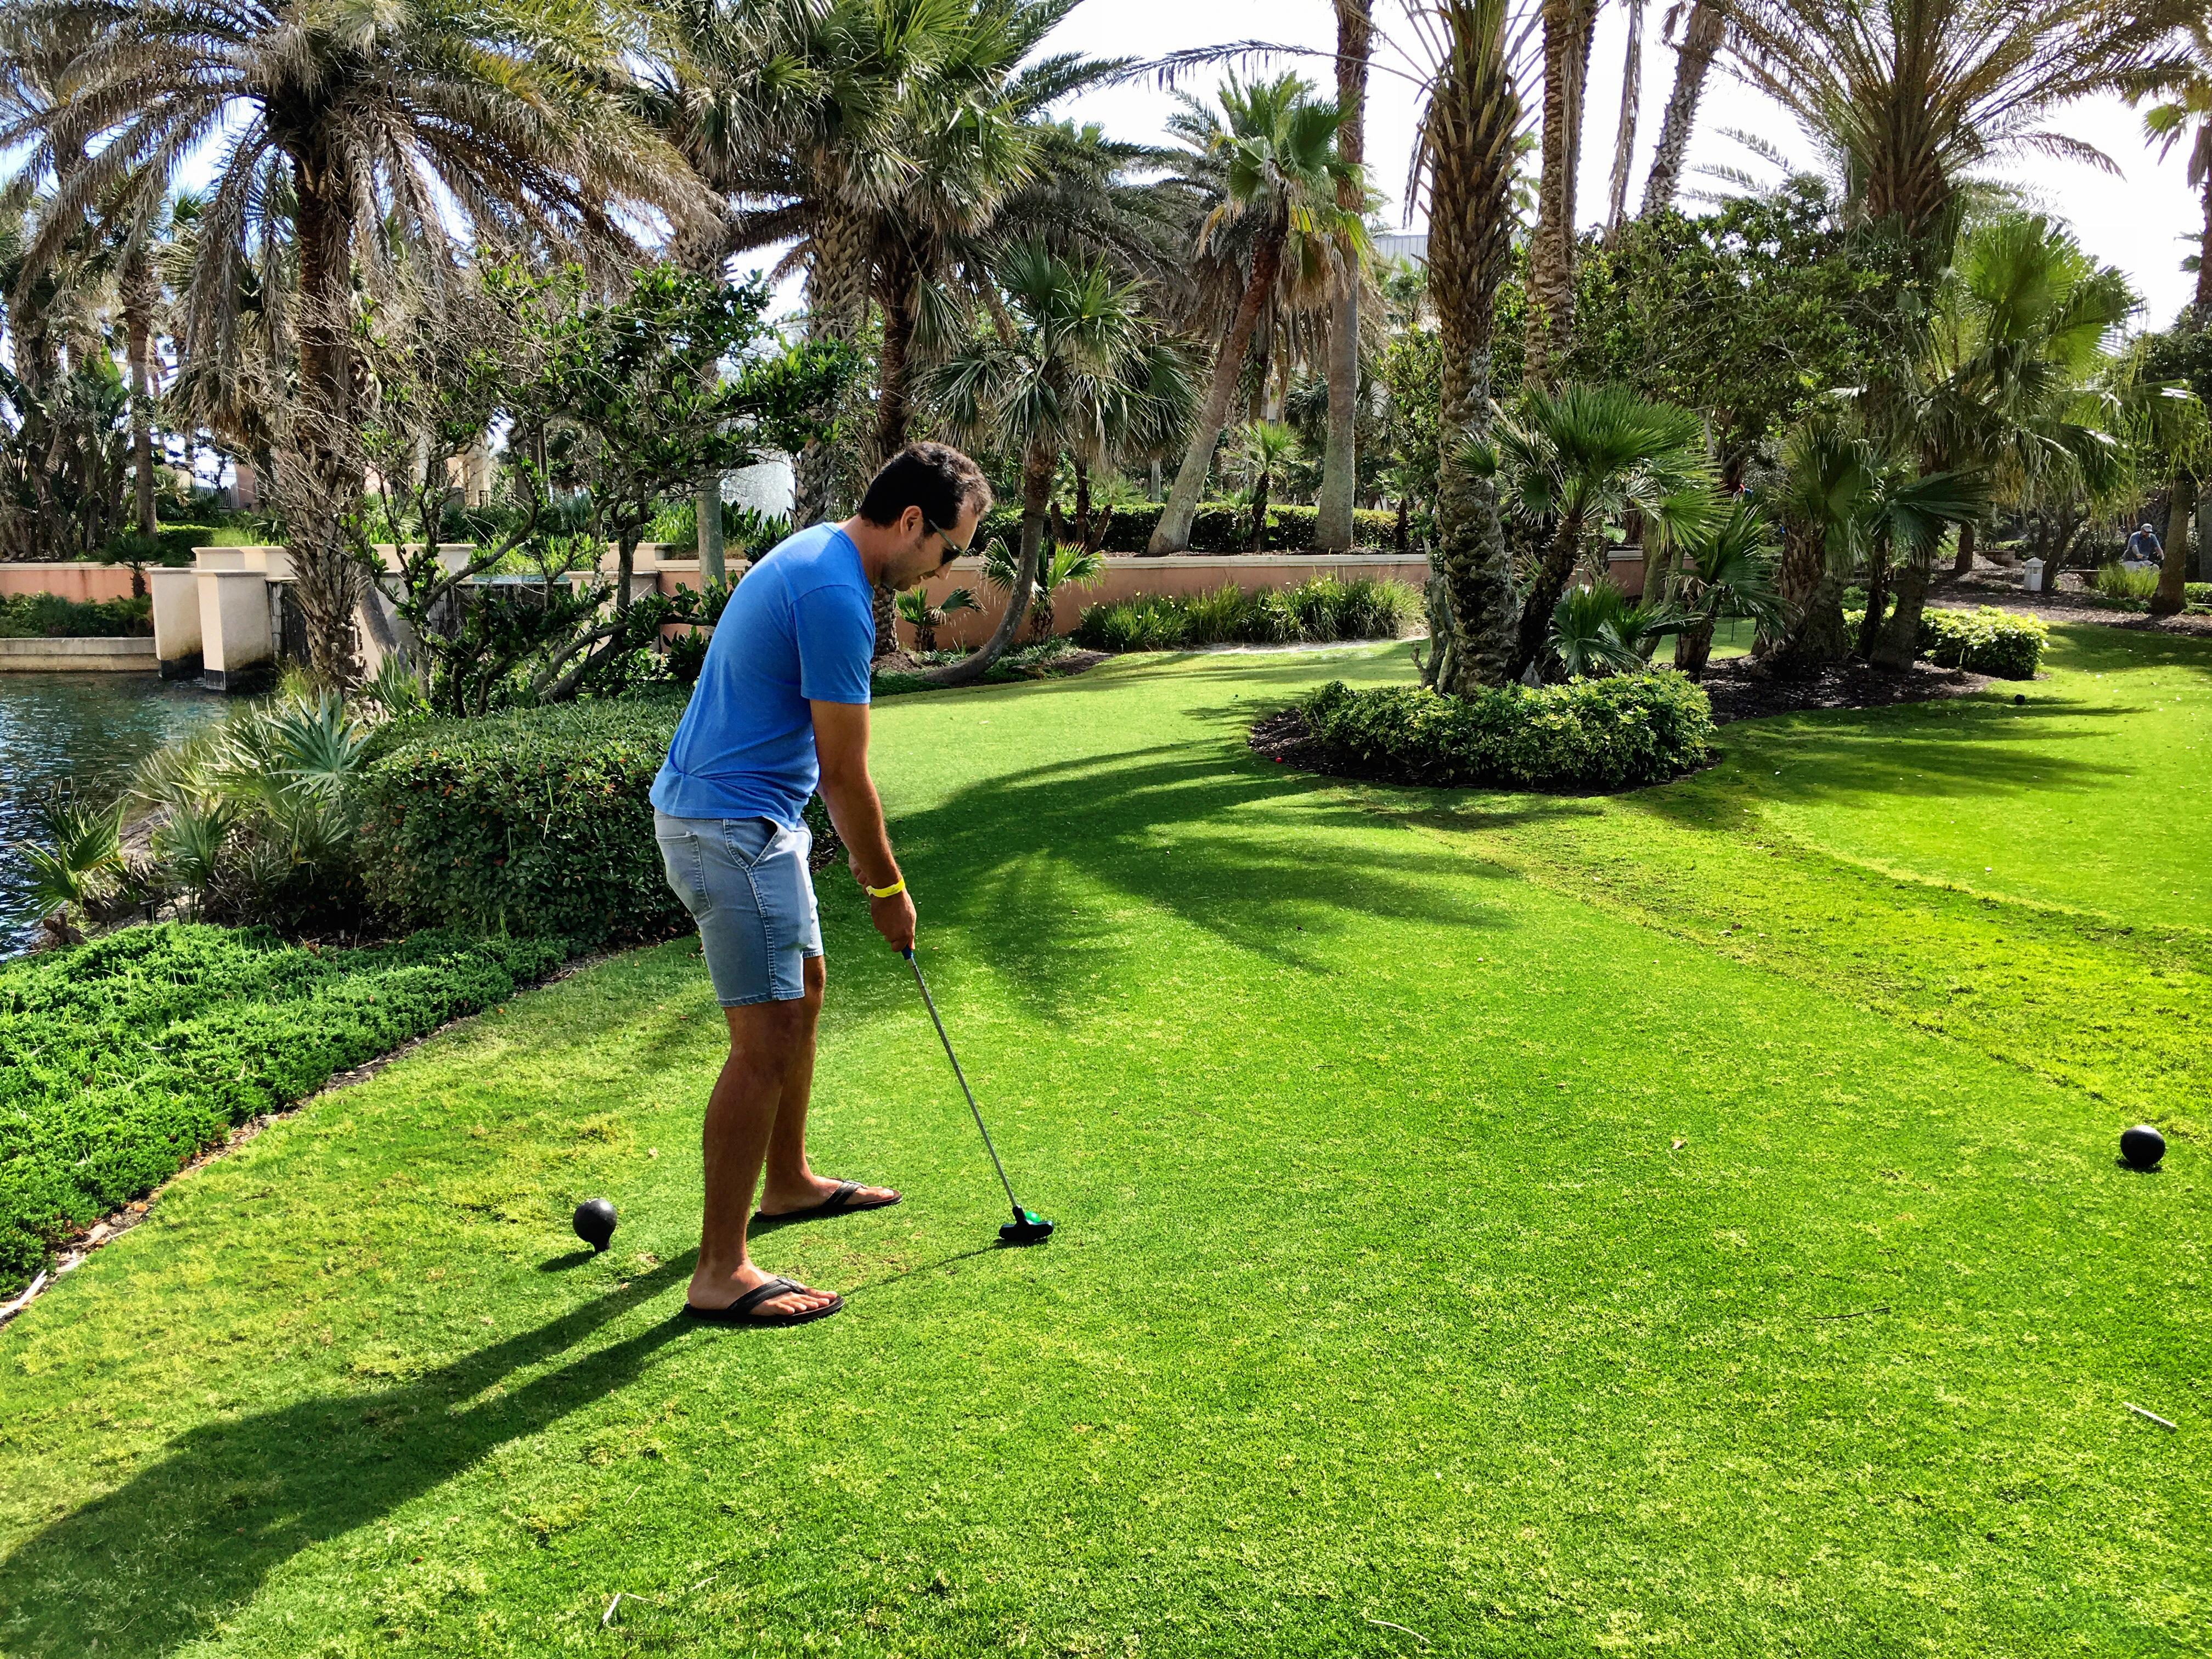 Putting Green at Hammock Beach Resort